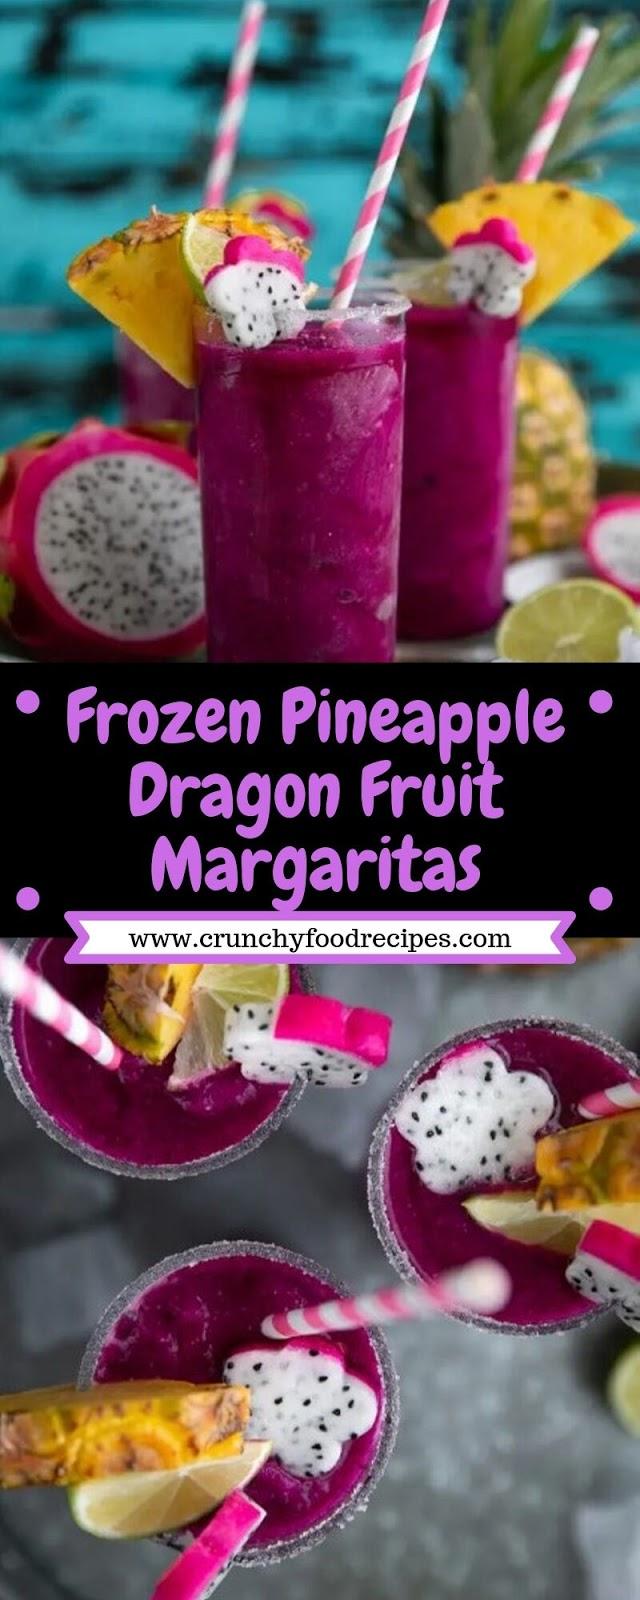 Frozen Pineapple Dragon Fruit Margaritas